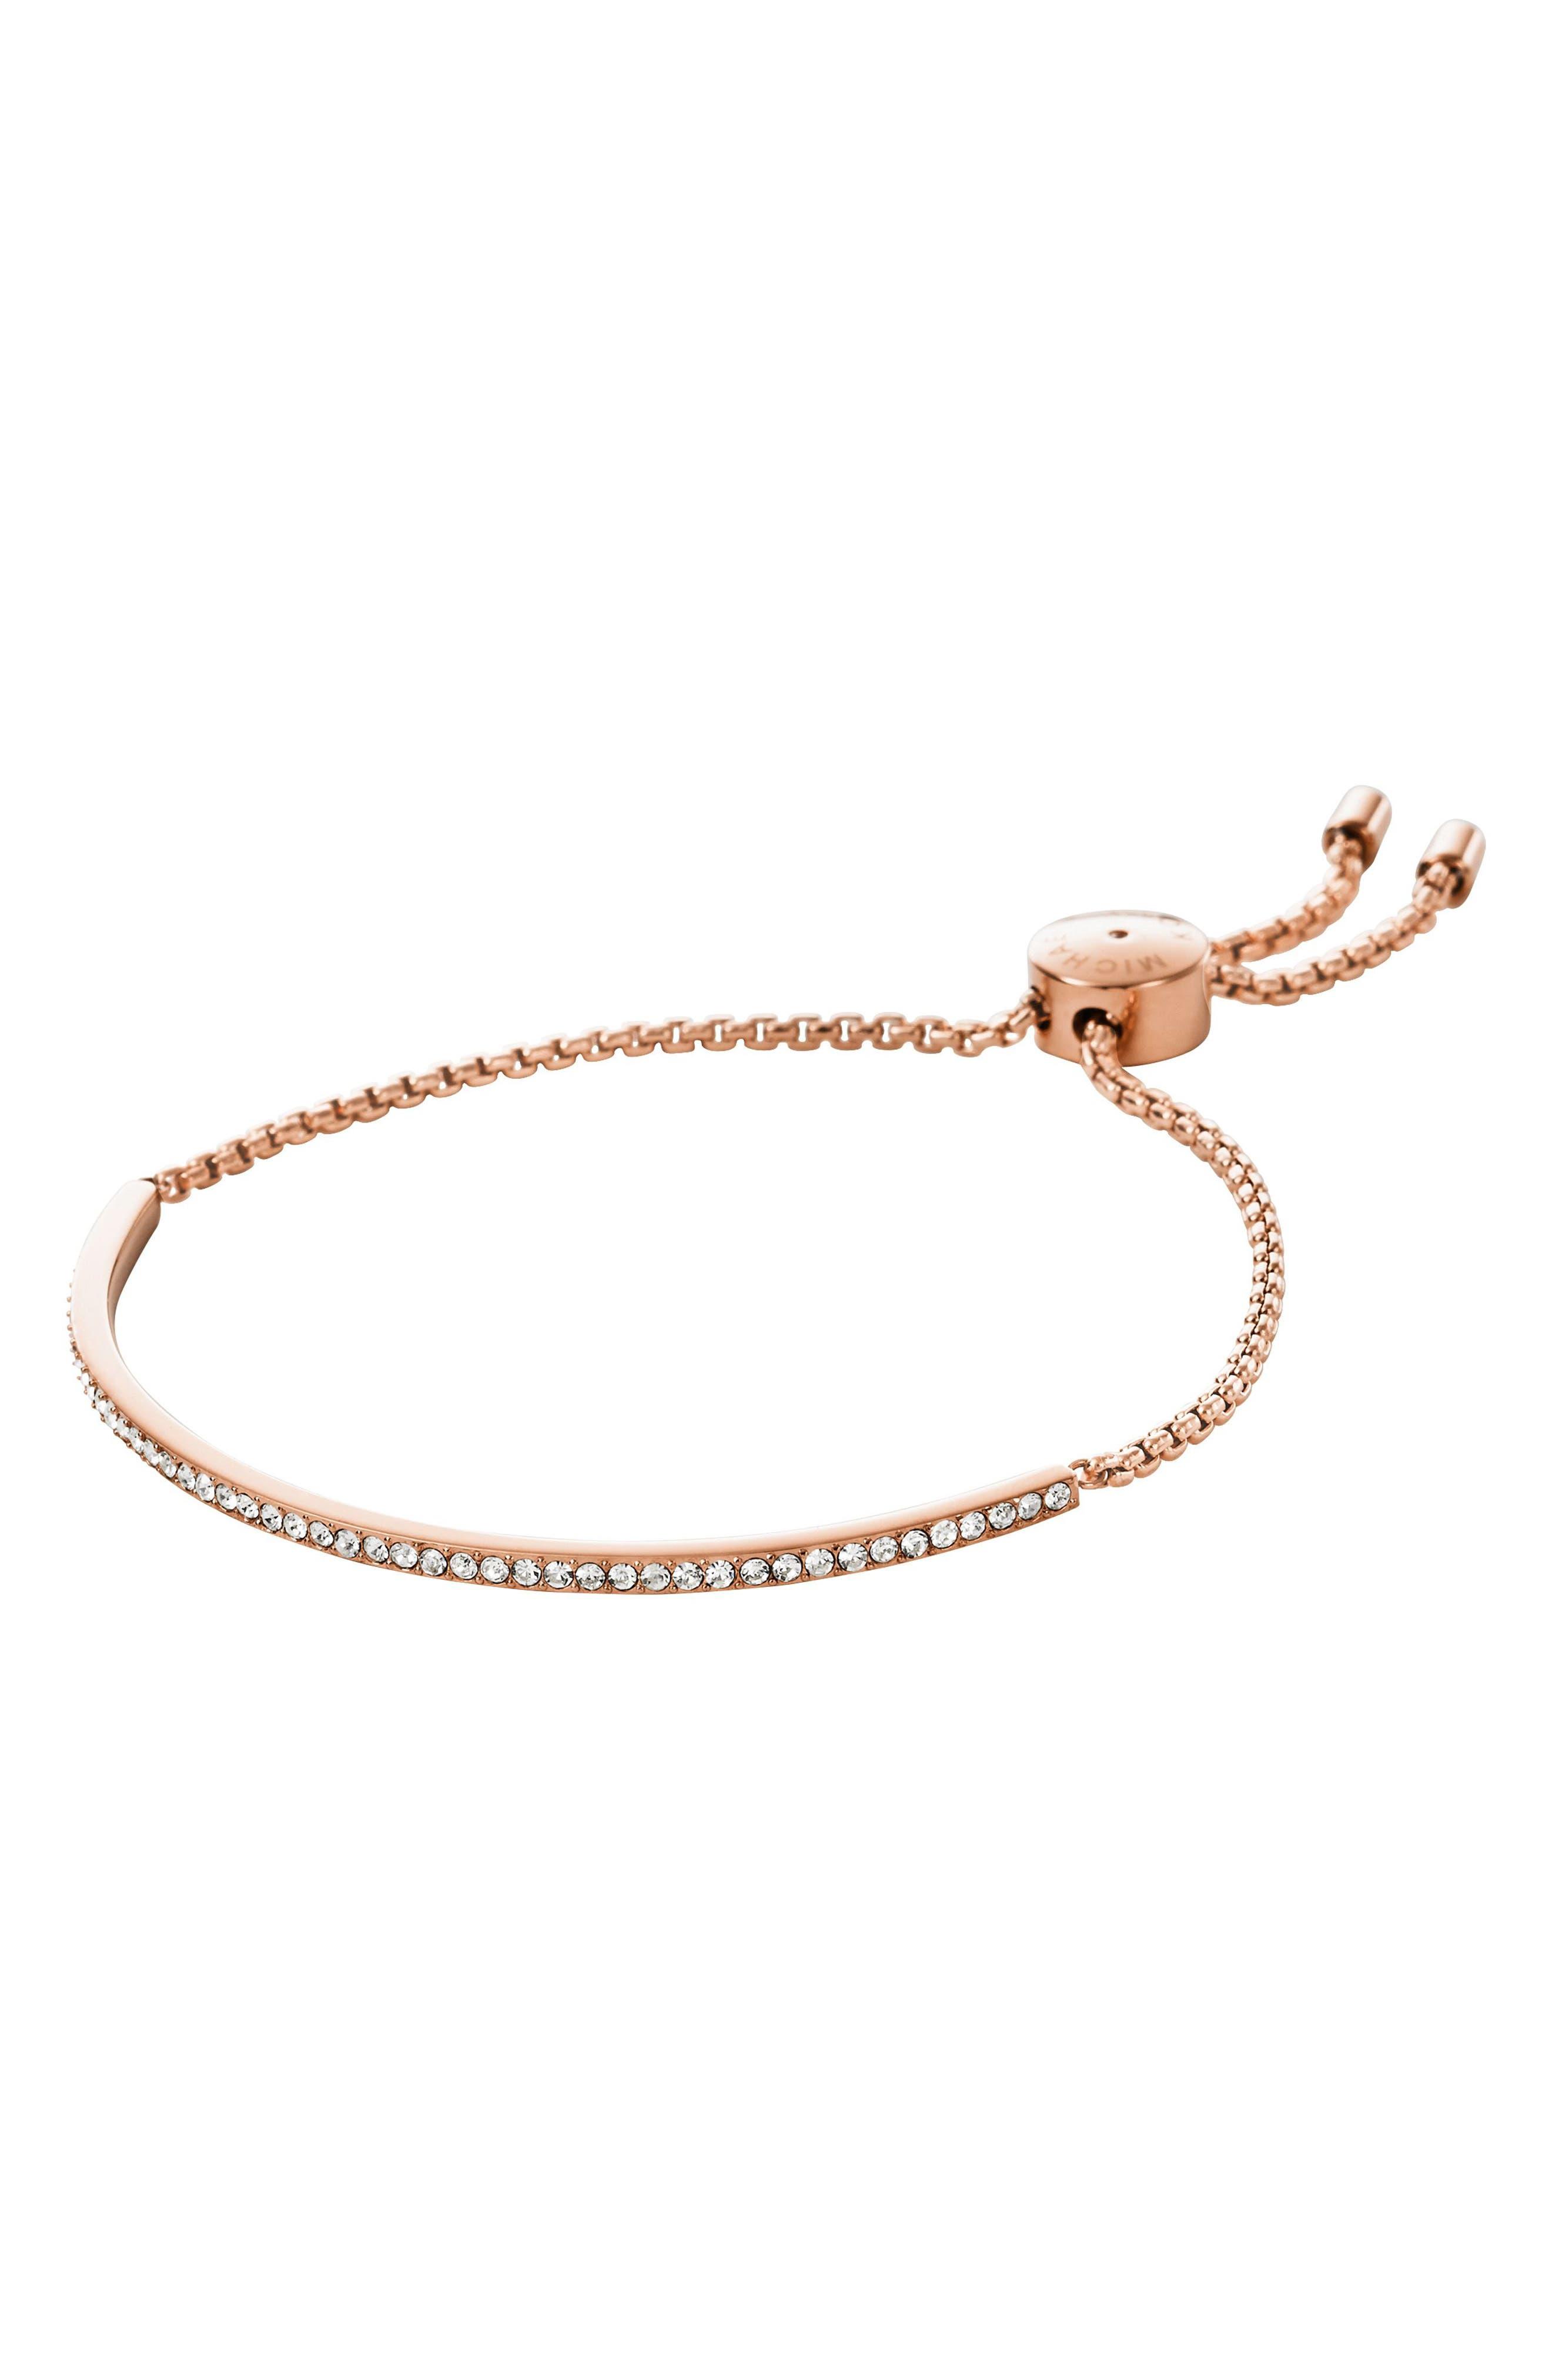 Main Image - Michael Kors Crystal Skinny Bracelet